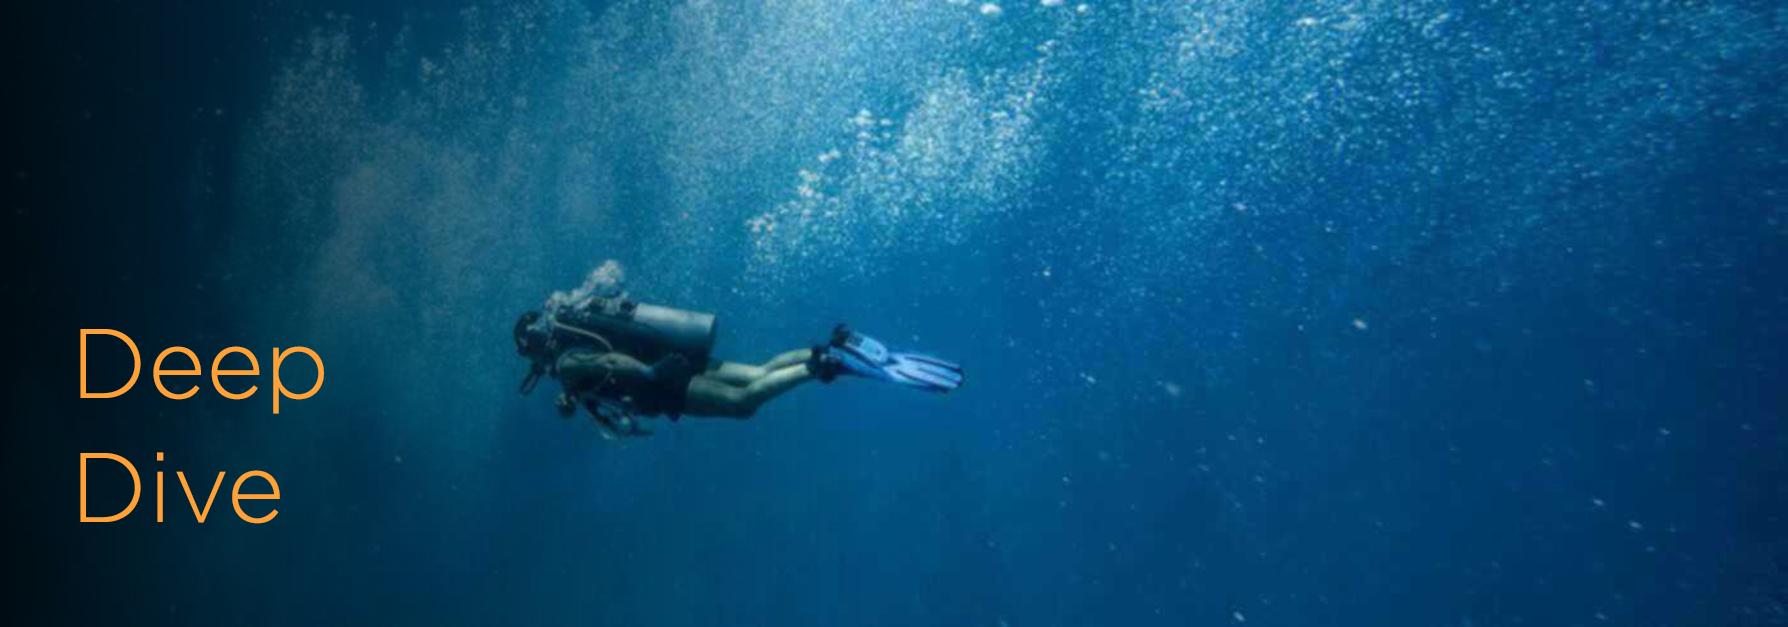 Deep Dive Banner